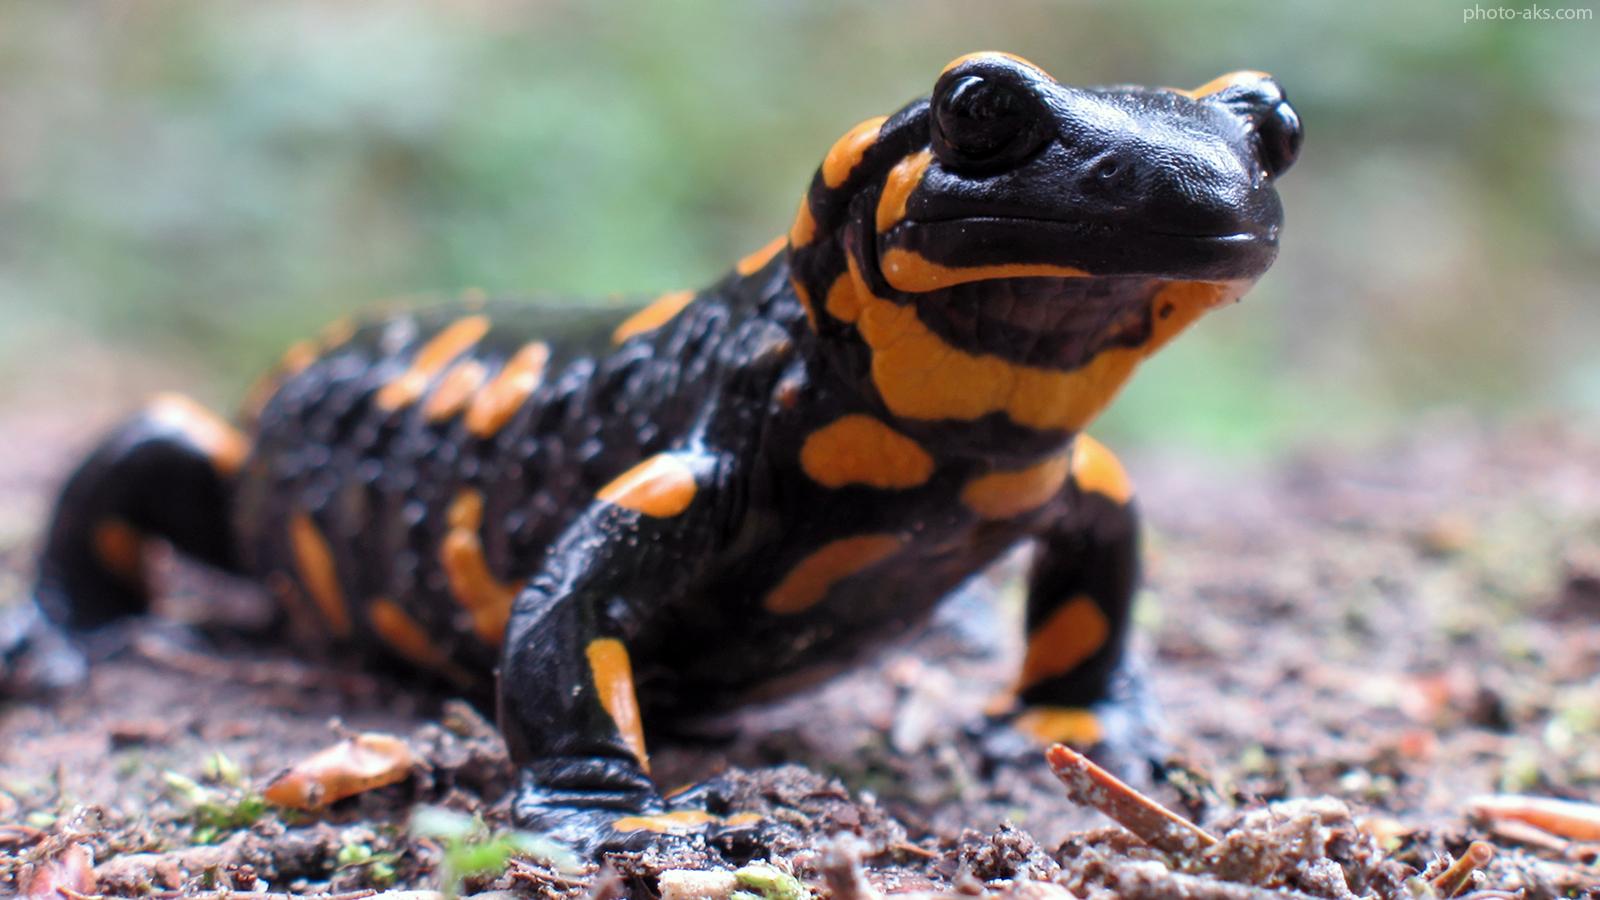 fire-salamander-black-orange